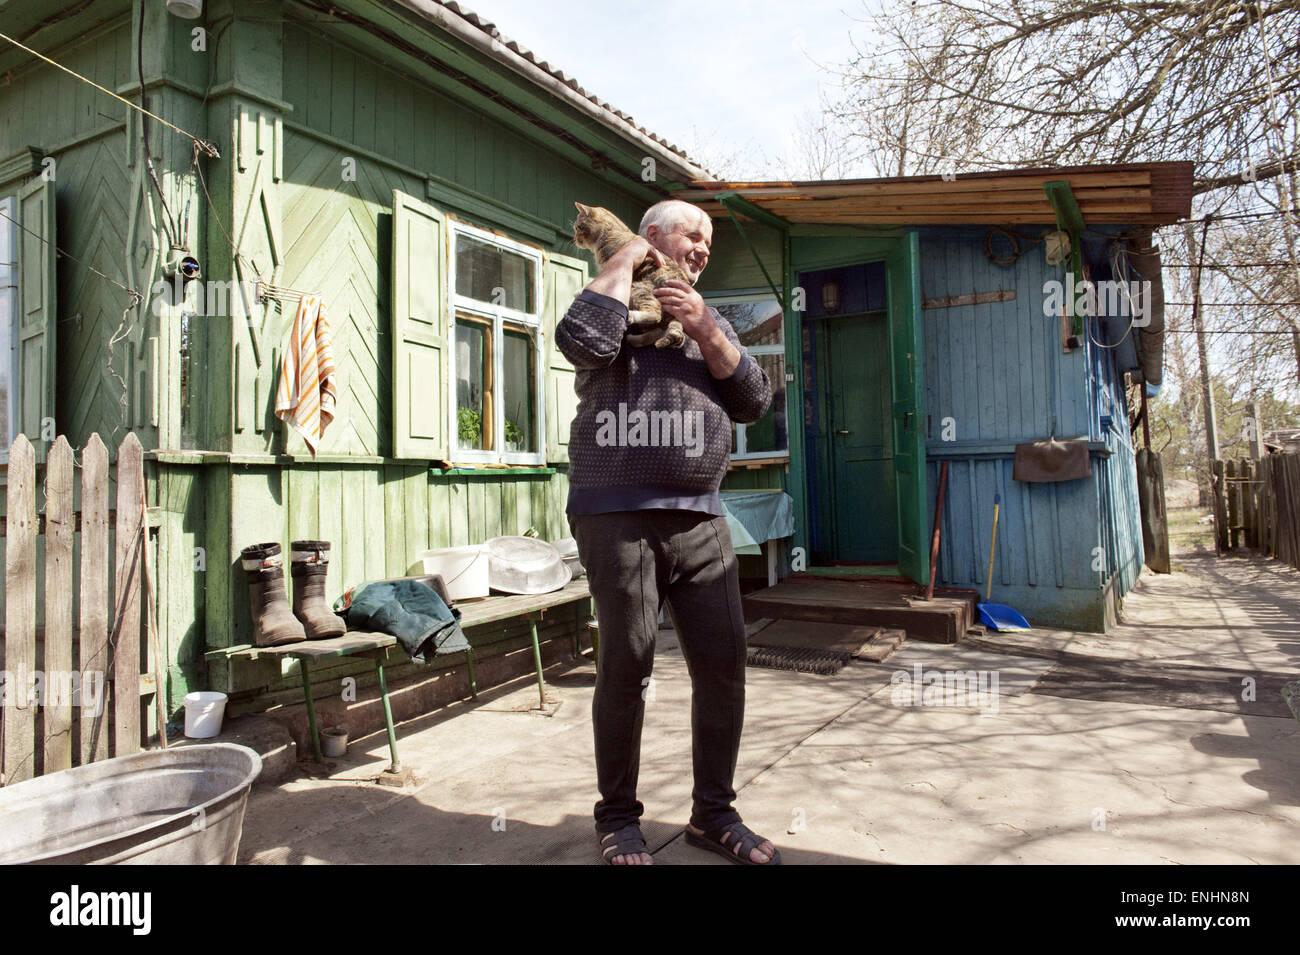 April 24, 2015 - Chernobyl, Ukraine - Ukraine. Pripyat. Chernobyl. M. Lavriejenko. He is 59 years old...Several - Stock Image